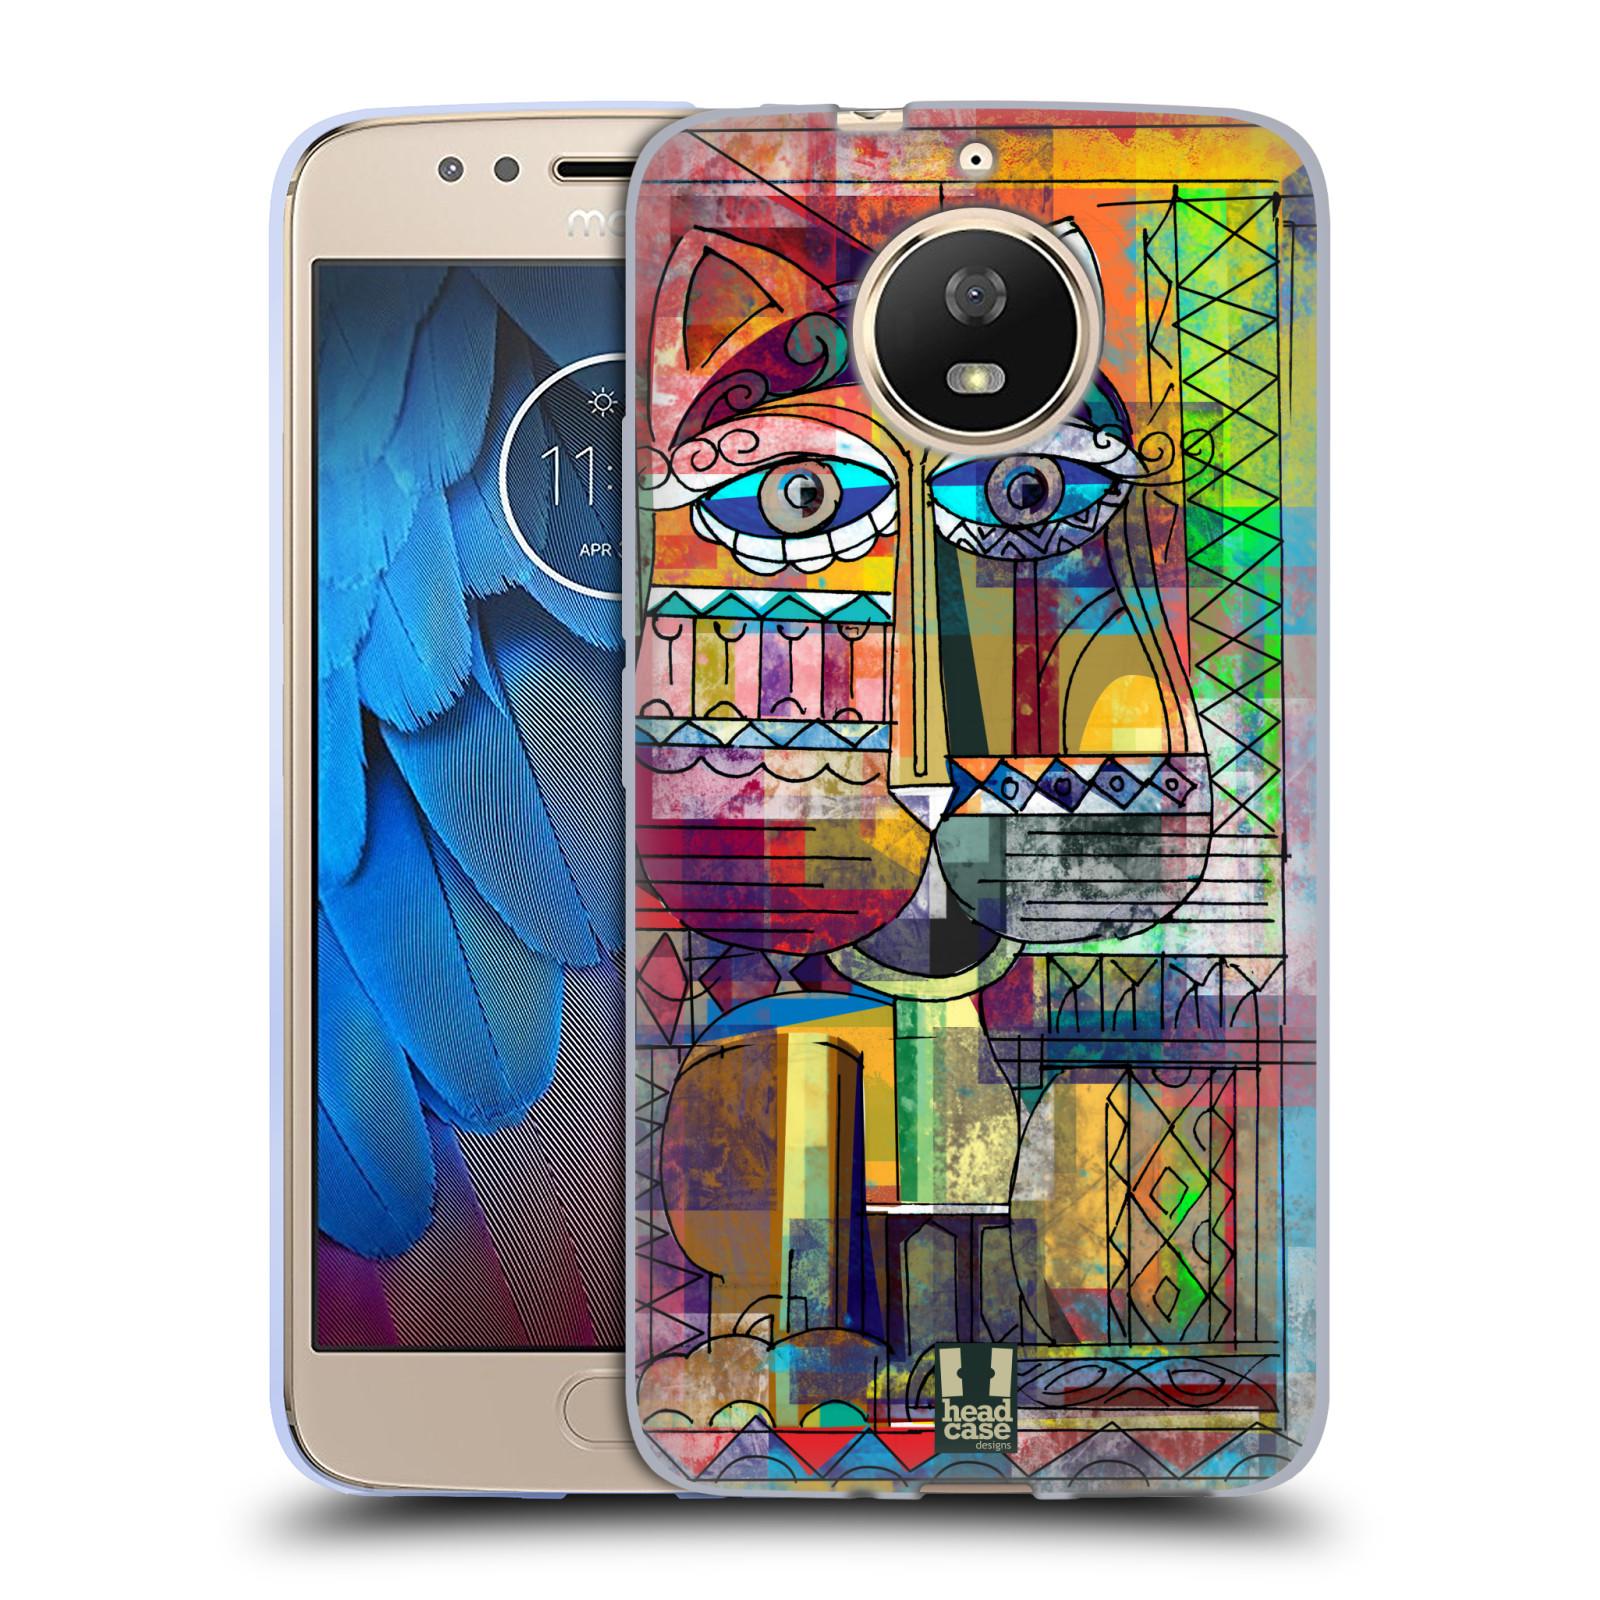 Silikonové pouzdro na mobil Lenovo Moto G5s - Head Case - AZTEC KORAT